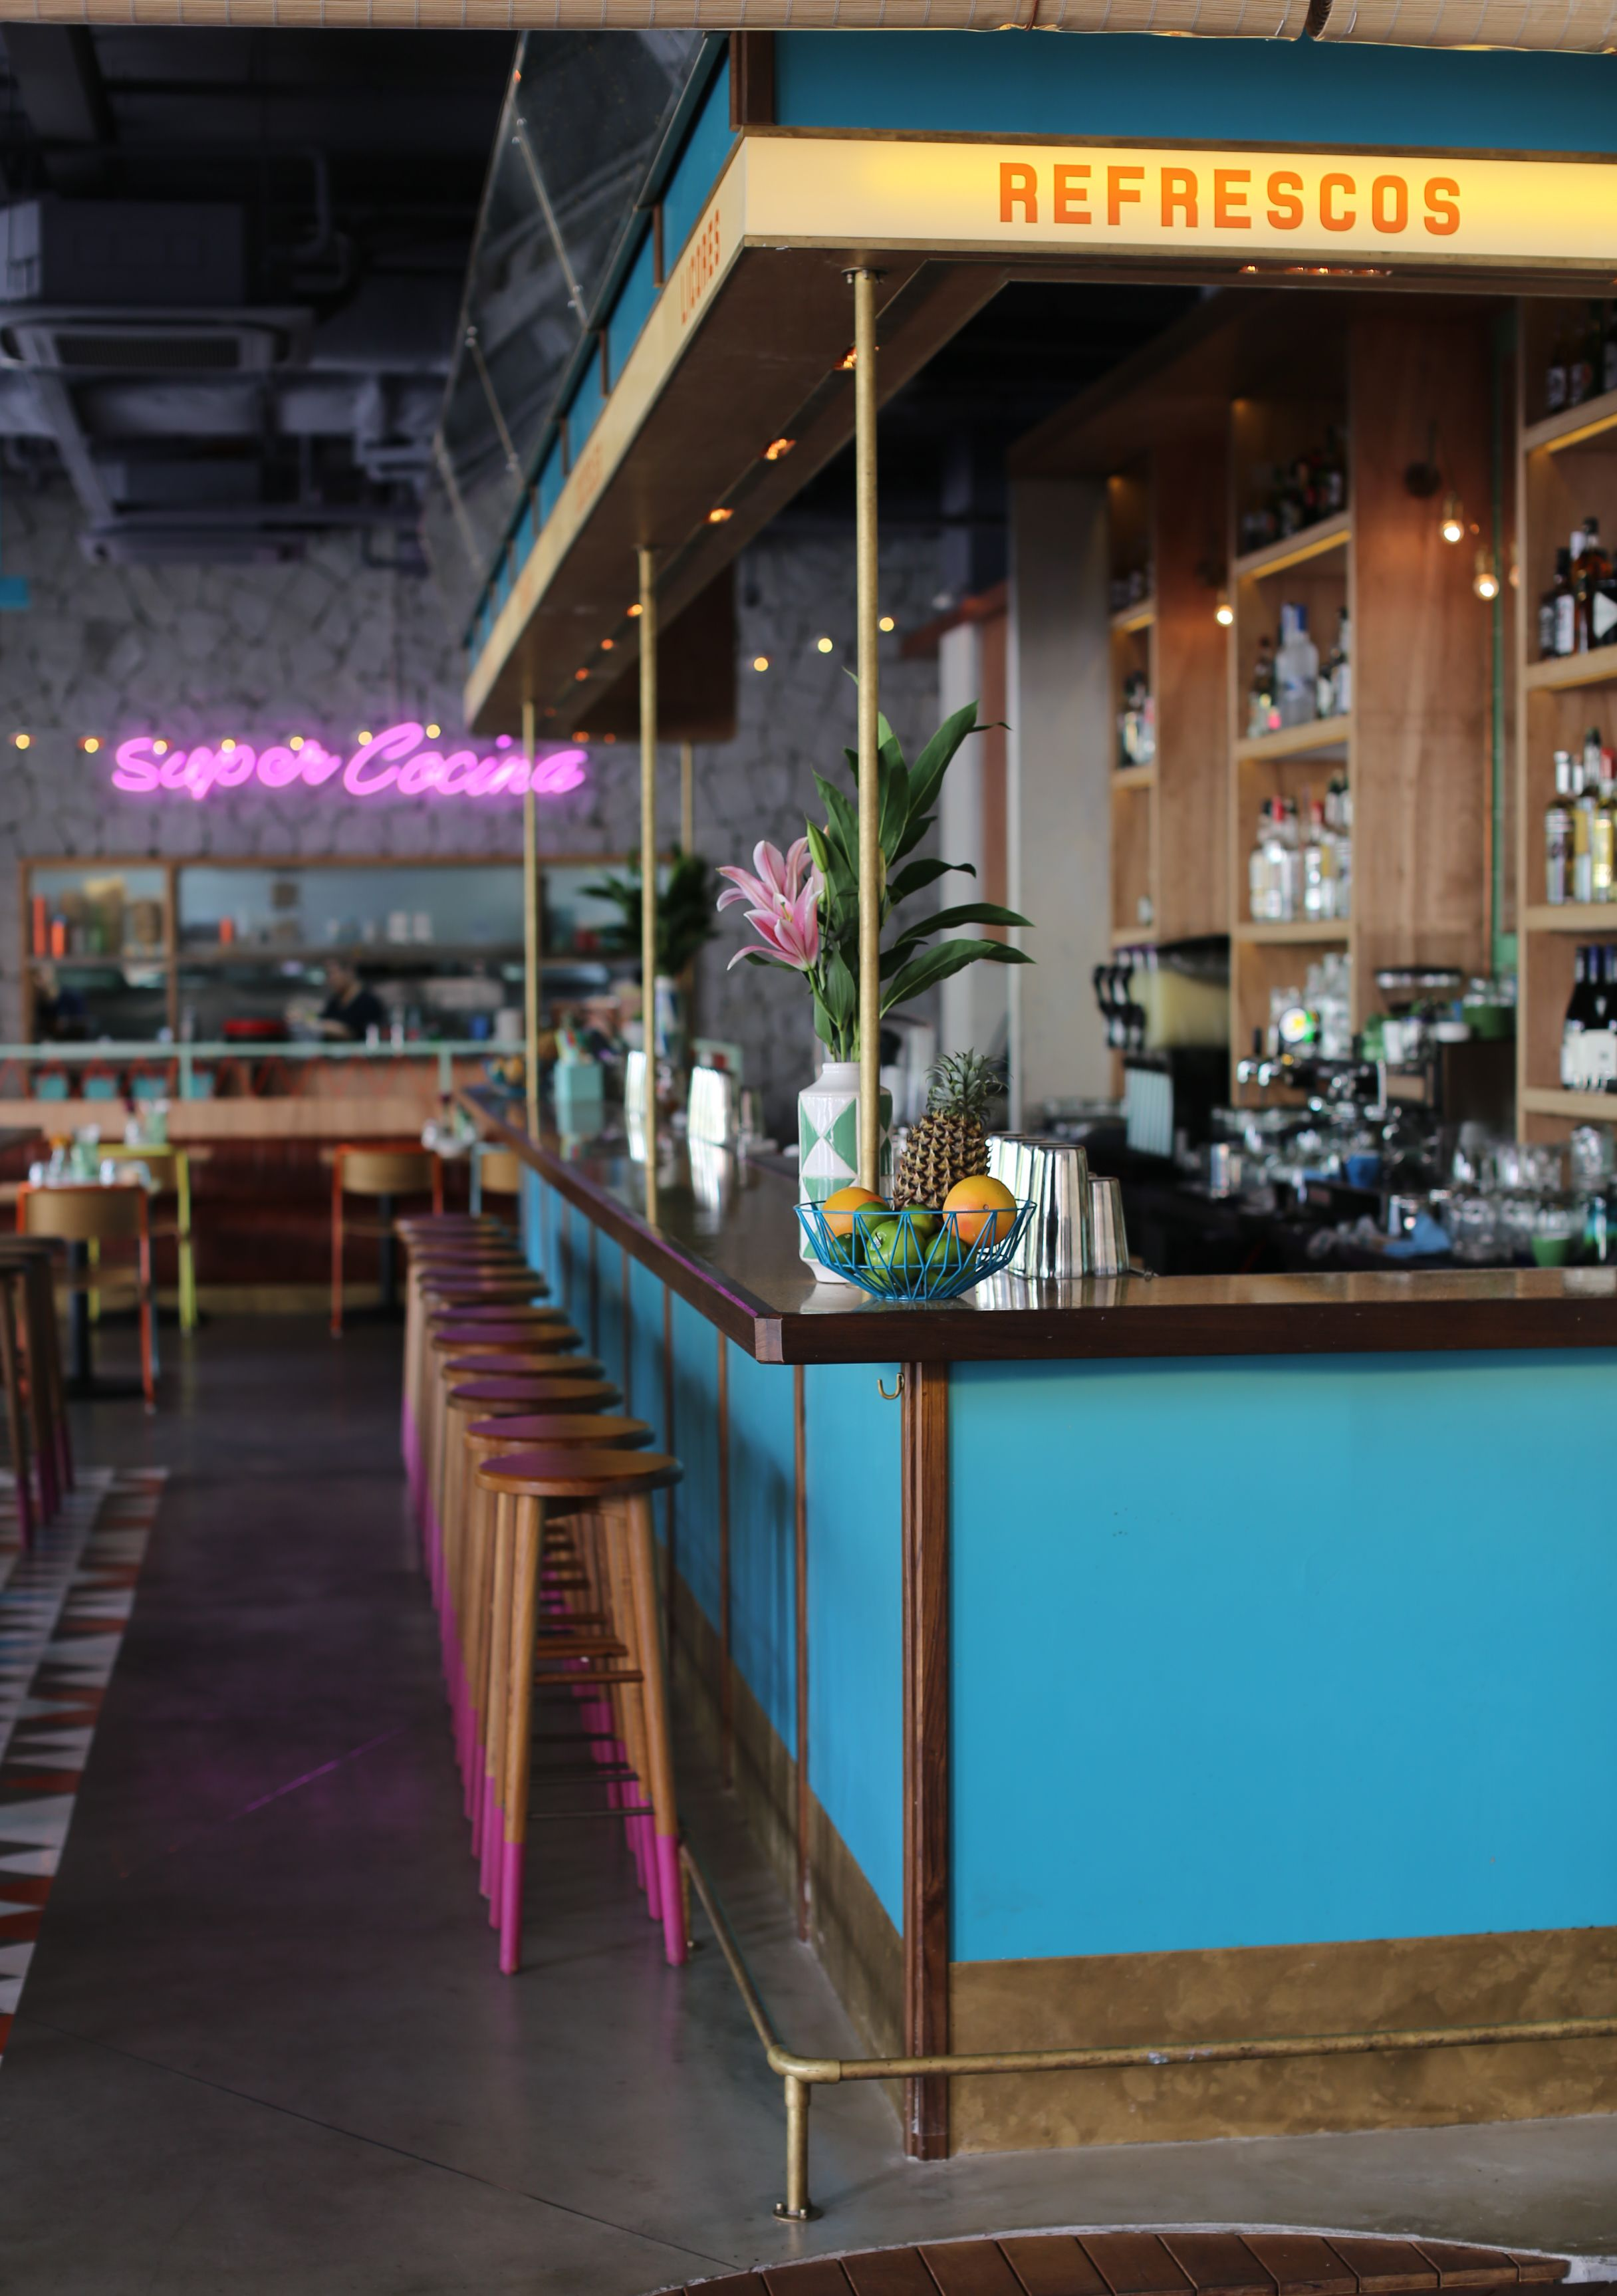 Super Loco Mexican Restaurant And Bar Robertson Quay Singapore Www Super Loco Com Restaurant Design Inspiration Mexican Restaurant Design Bar Design Restaurant